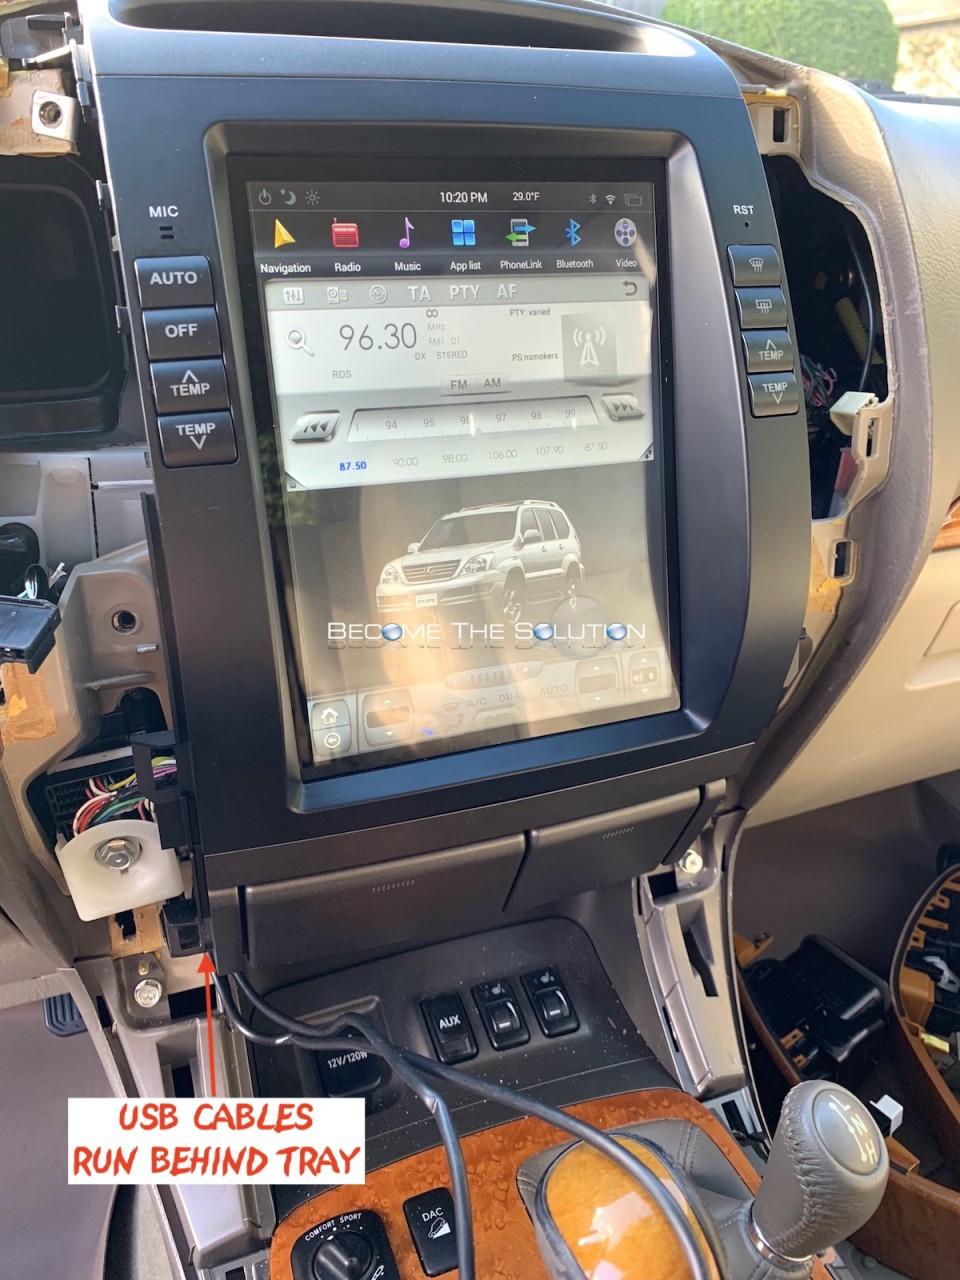 Phoenix android radio lexus gx 470 usb cables